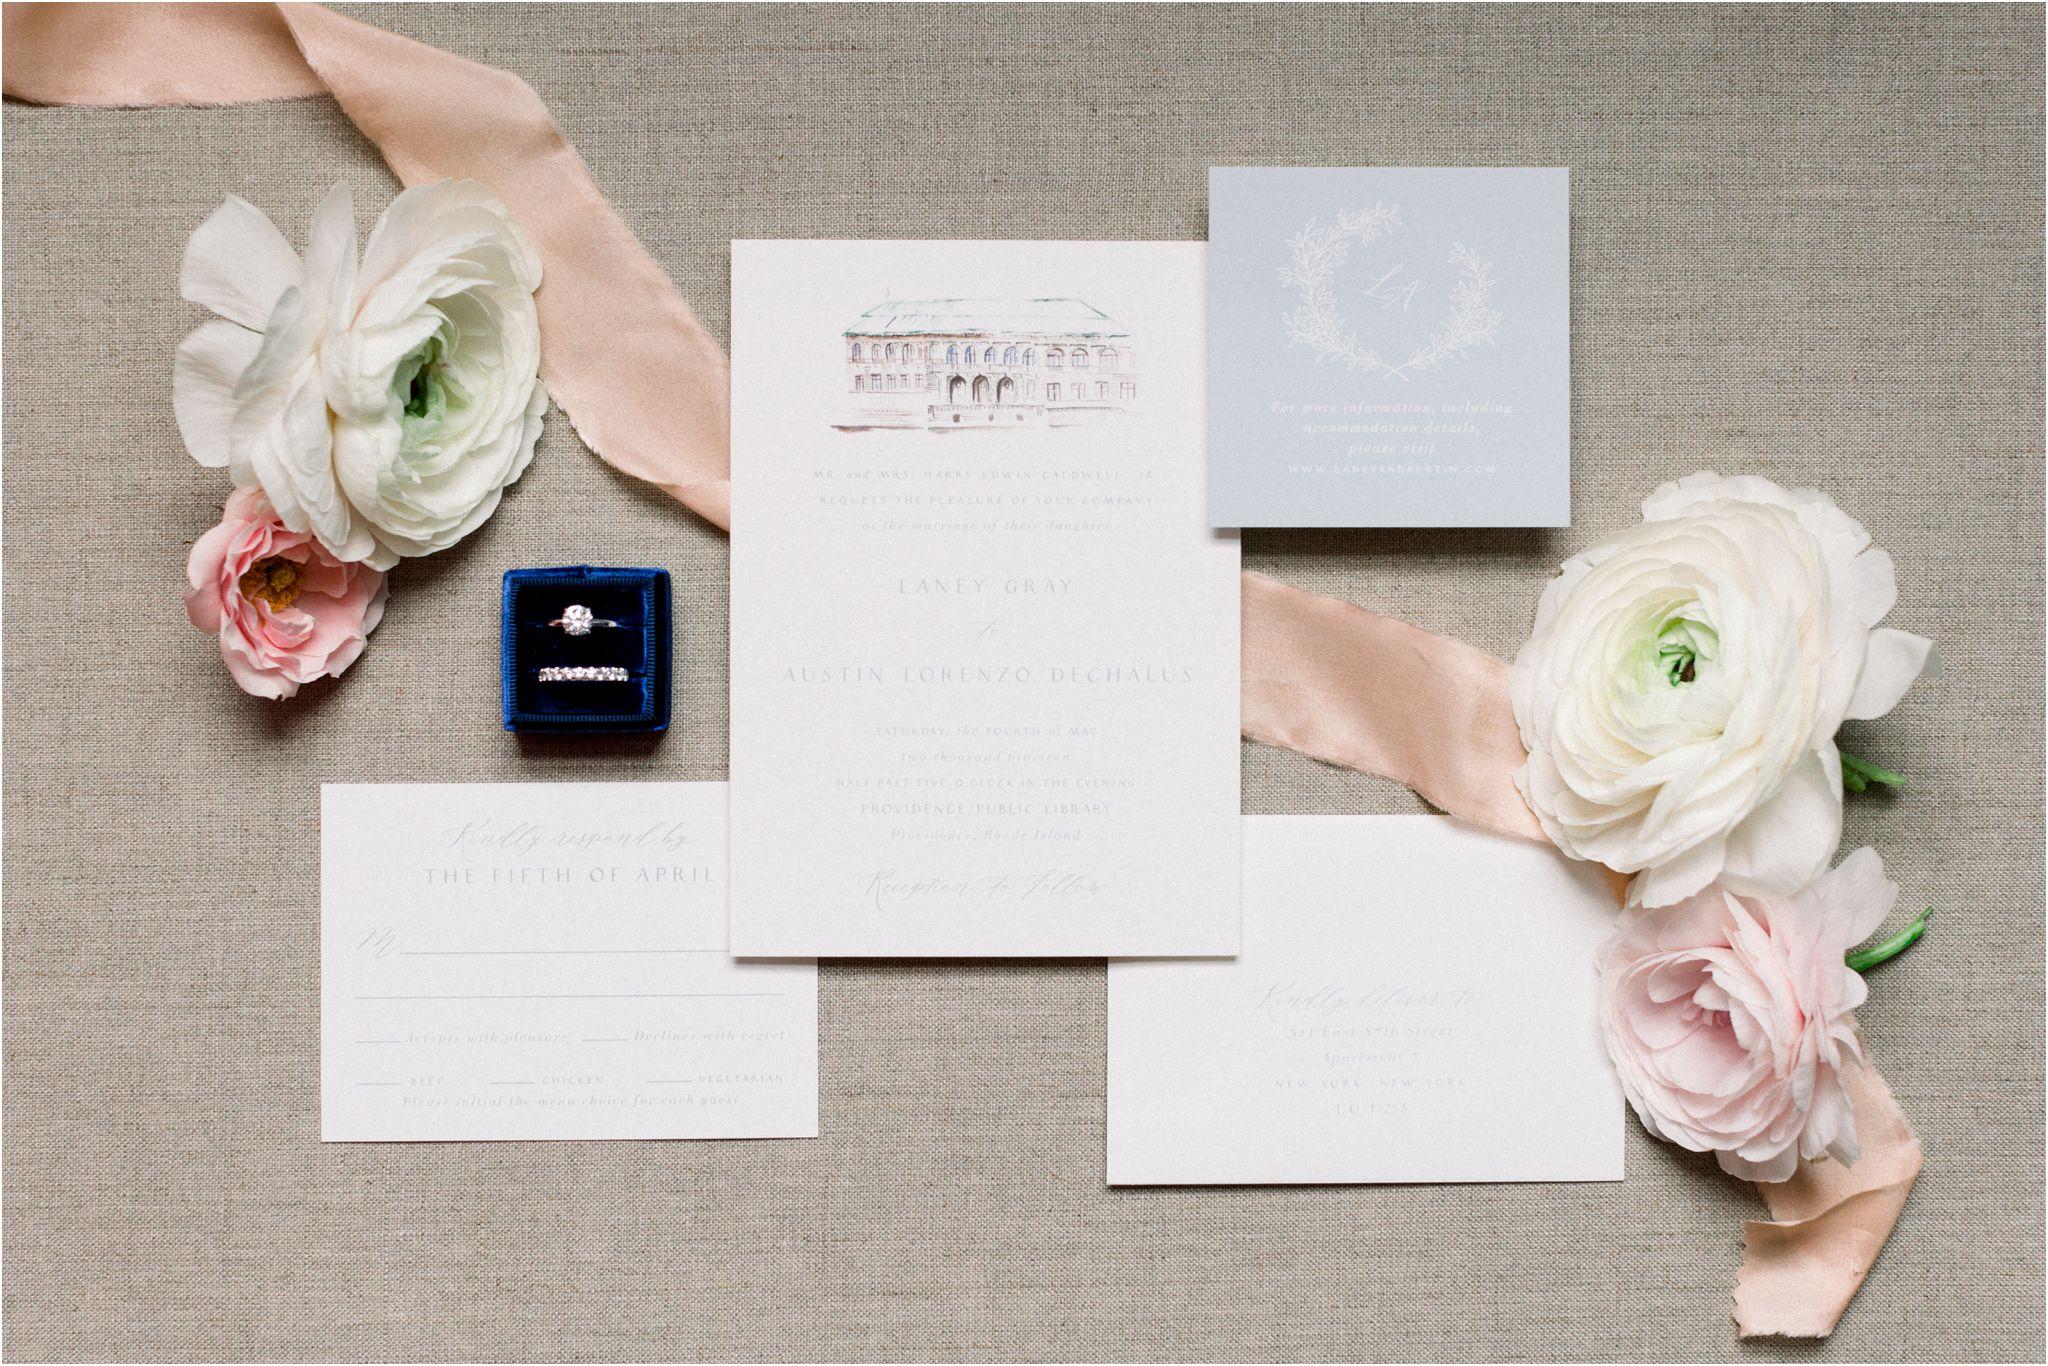 providence-public-library-wedding-images_00002.JPG